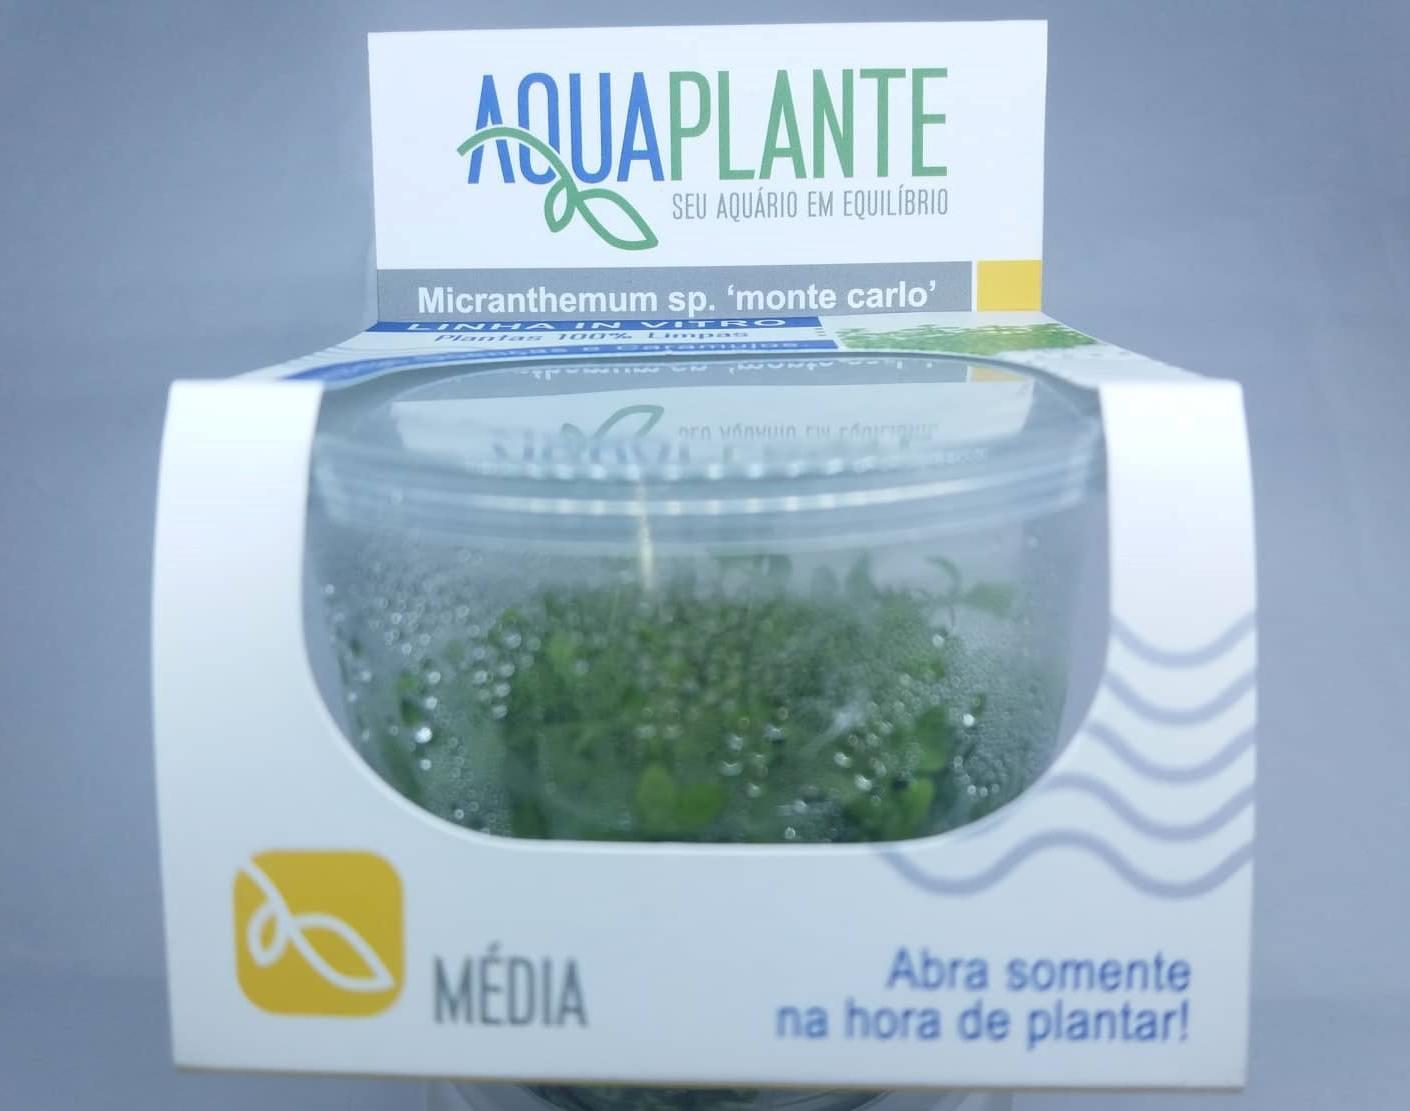 MICRANTHEMUM SP MONTE CARLO  'In vitro planta 100% LIVRE de pragas e algas'